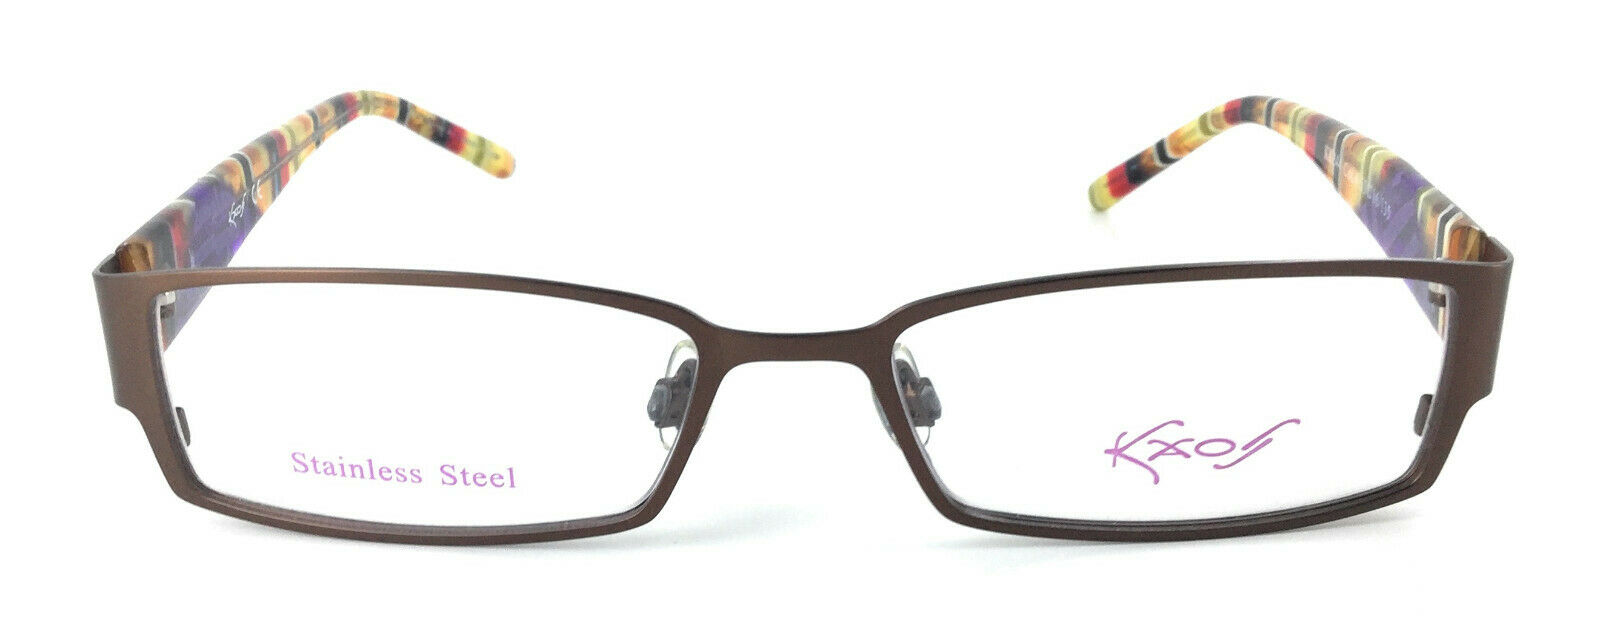 Kaos Brille Eyeglasses Mod. KK244 Color-4 incl. Etui